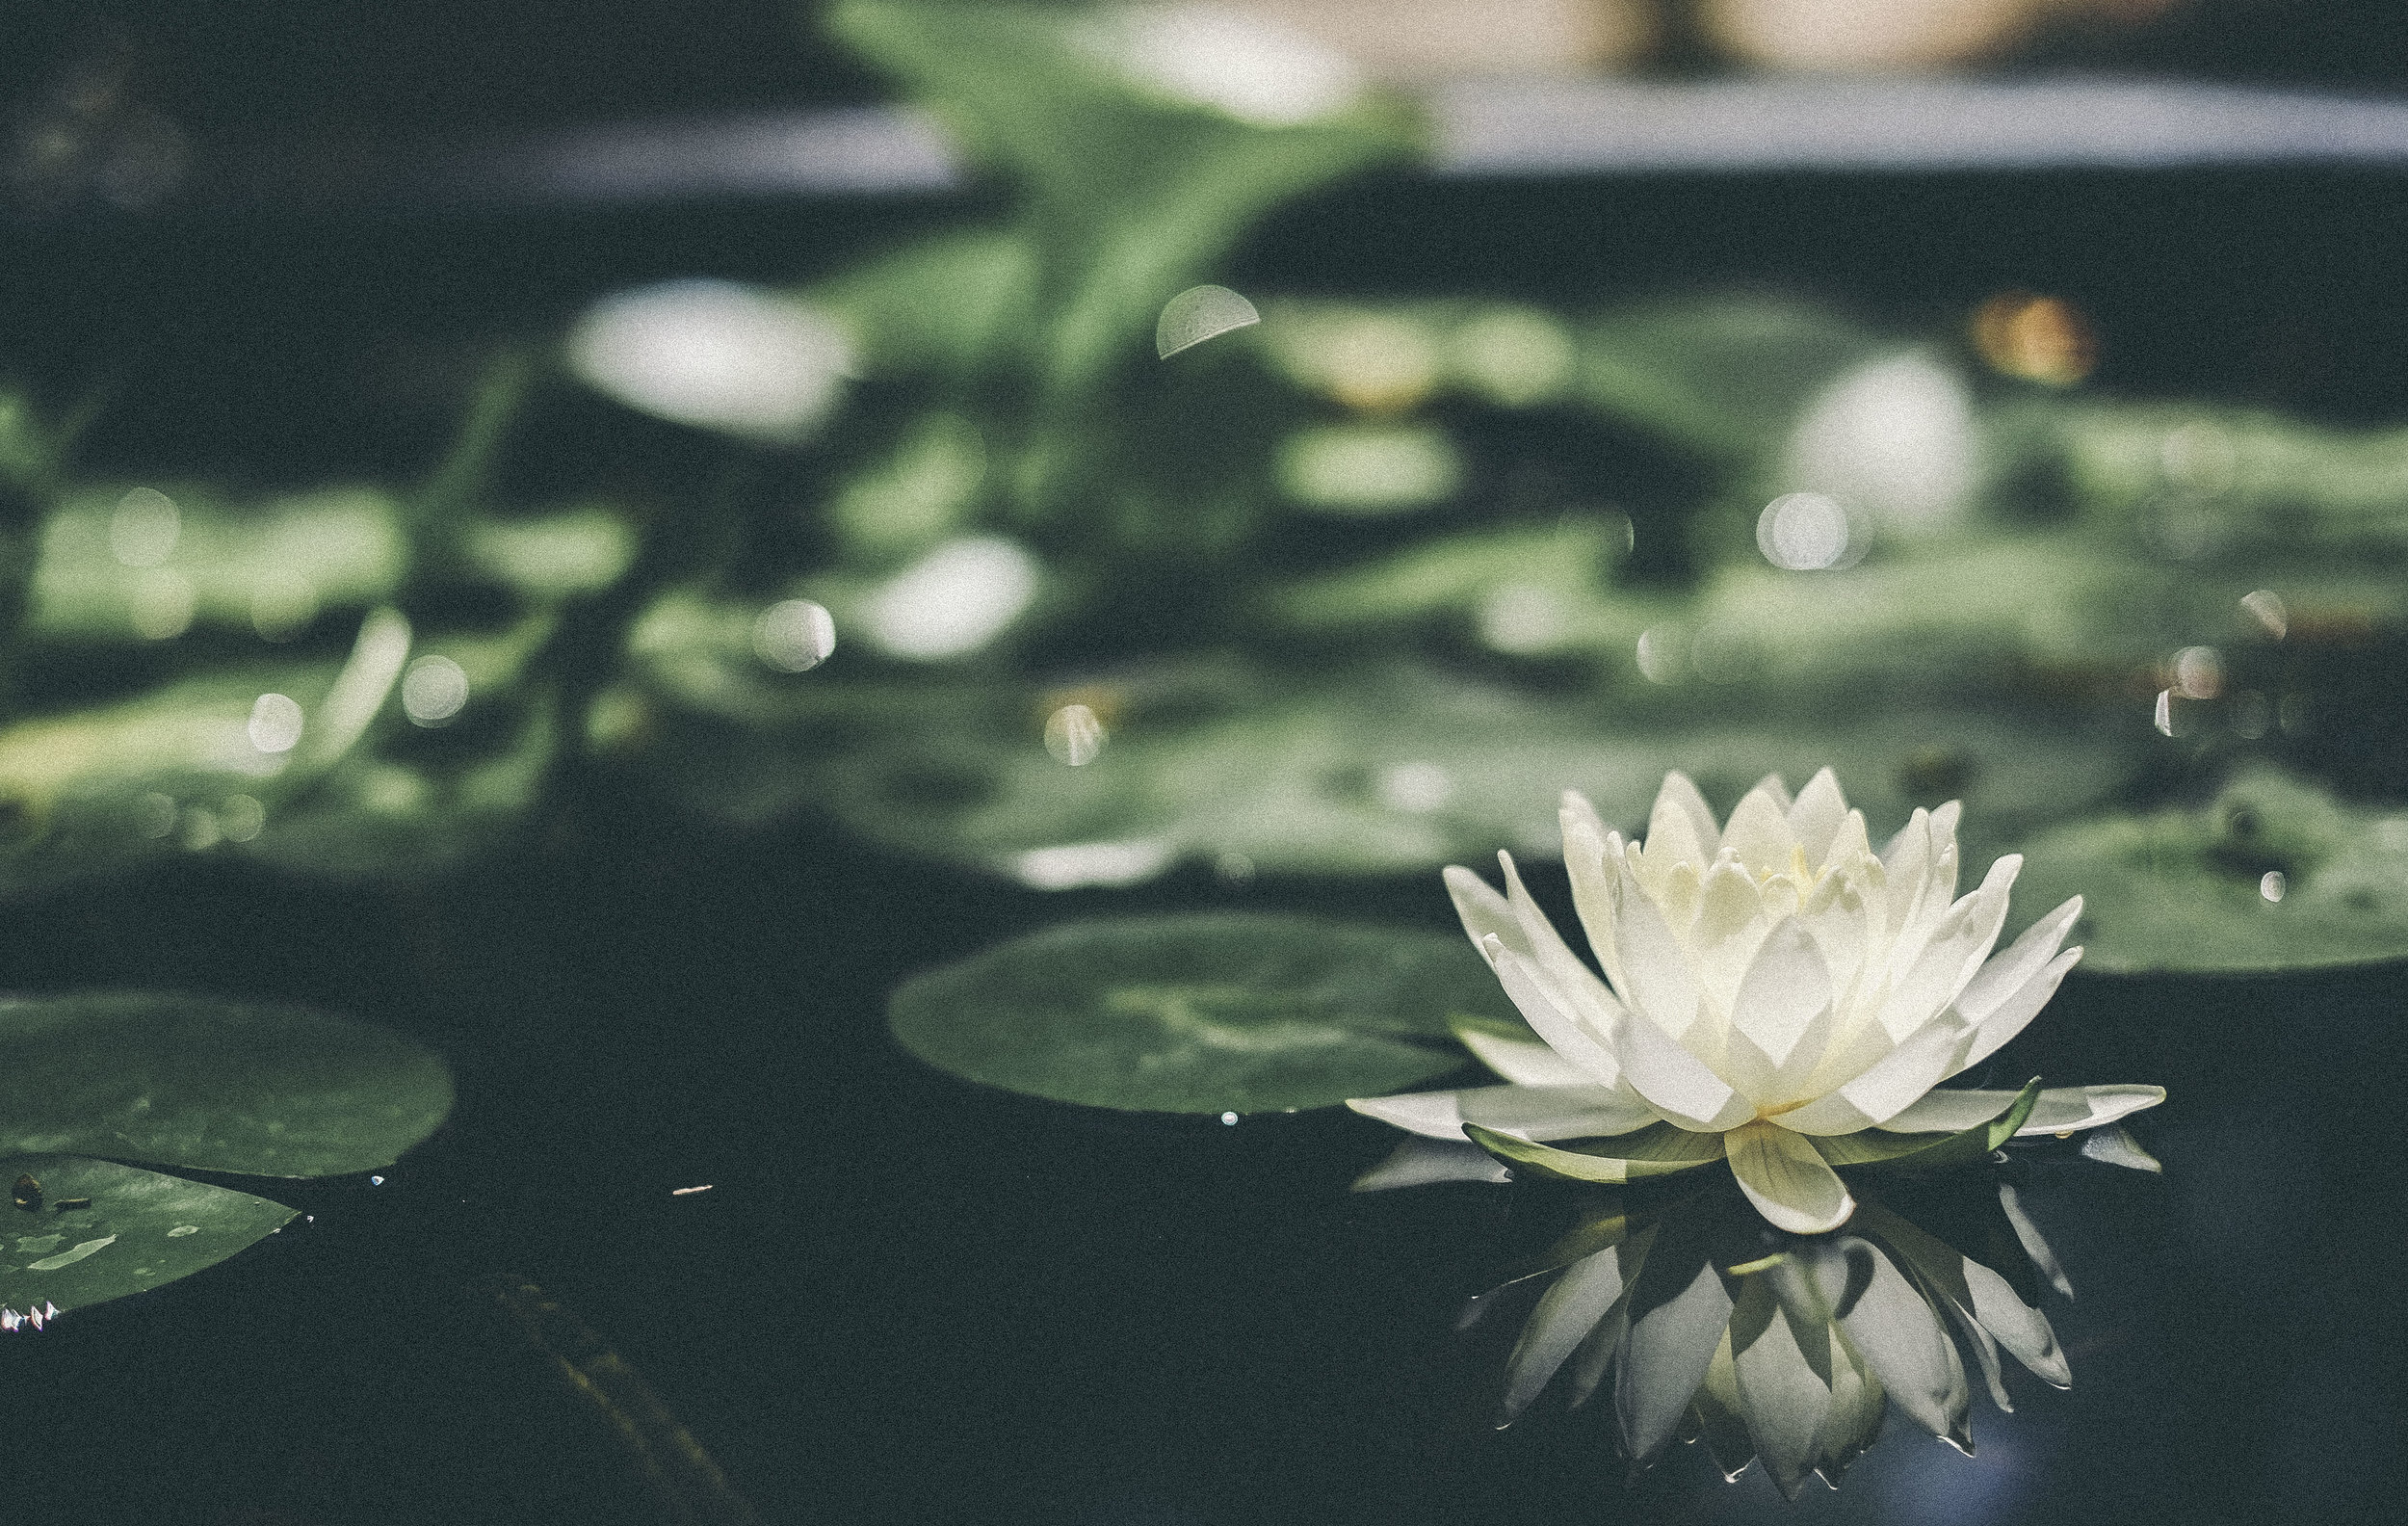 #waterlily #flower #photgraphy www.derrive.com